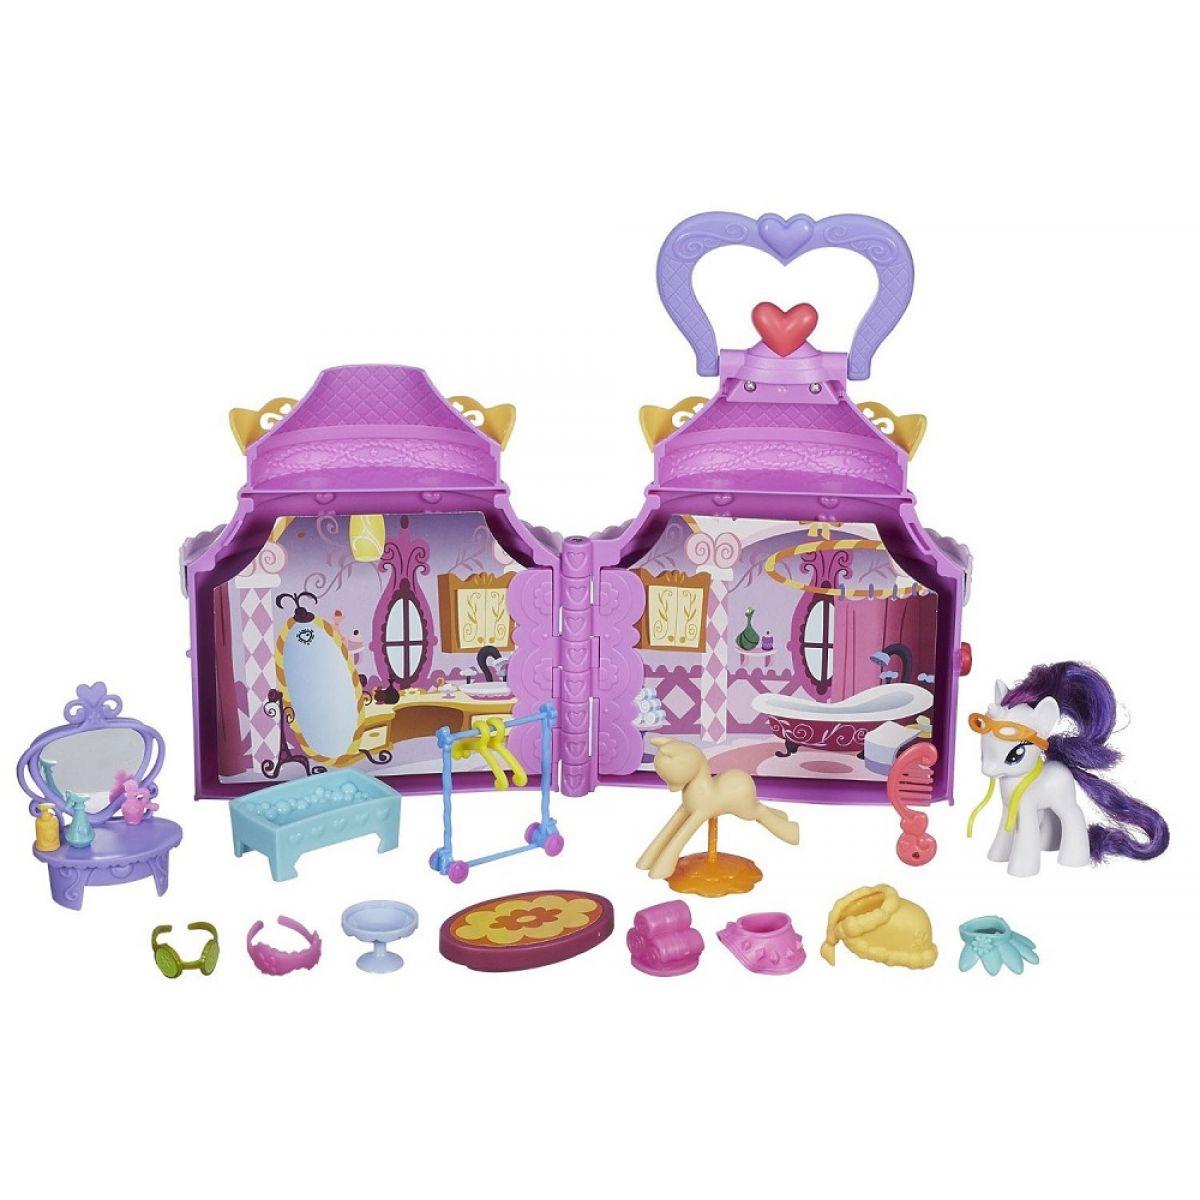 My Little Pony Cuttie Mark Magic Rarity butik